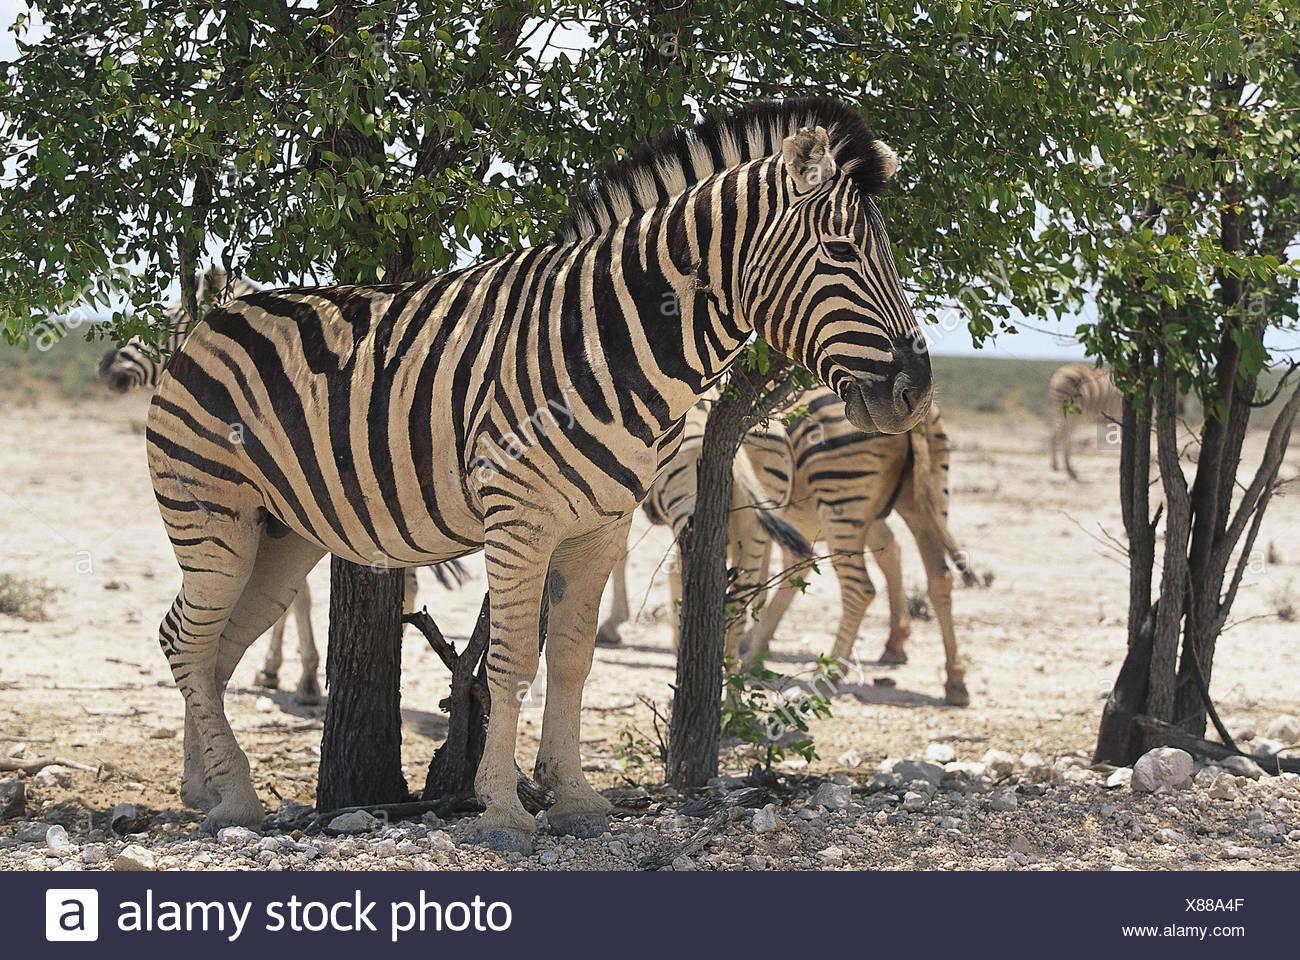 La Namibia, Etosha Nationalpark, Burchell-Zebras, Equus quagga burchelli, Bäume Afrika, Südwestafrika, Wüste, steppa, zebre, Pferde, Tigerpferde, Unpaarhufer, Säugetiere,Wildtiere, Unterstand, Schatten, Hitze Immagini Stock